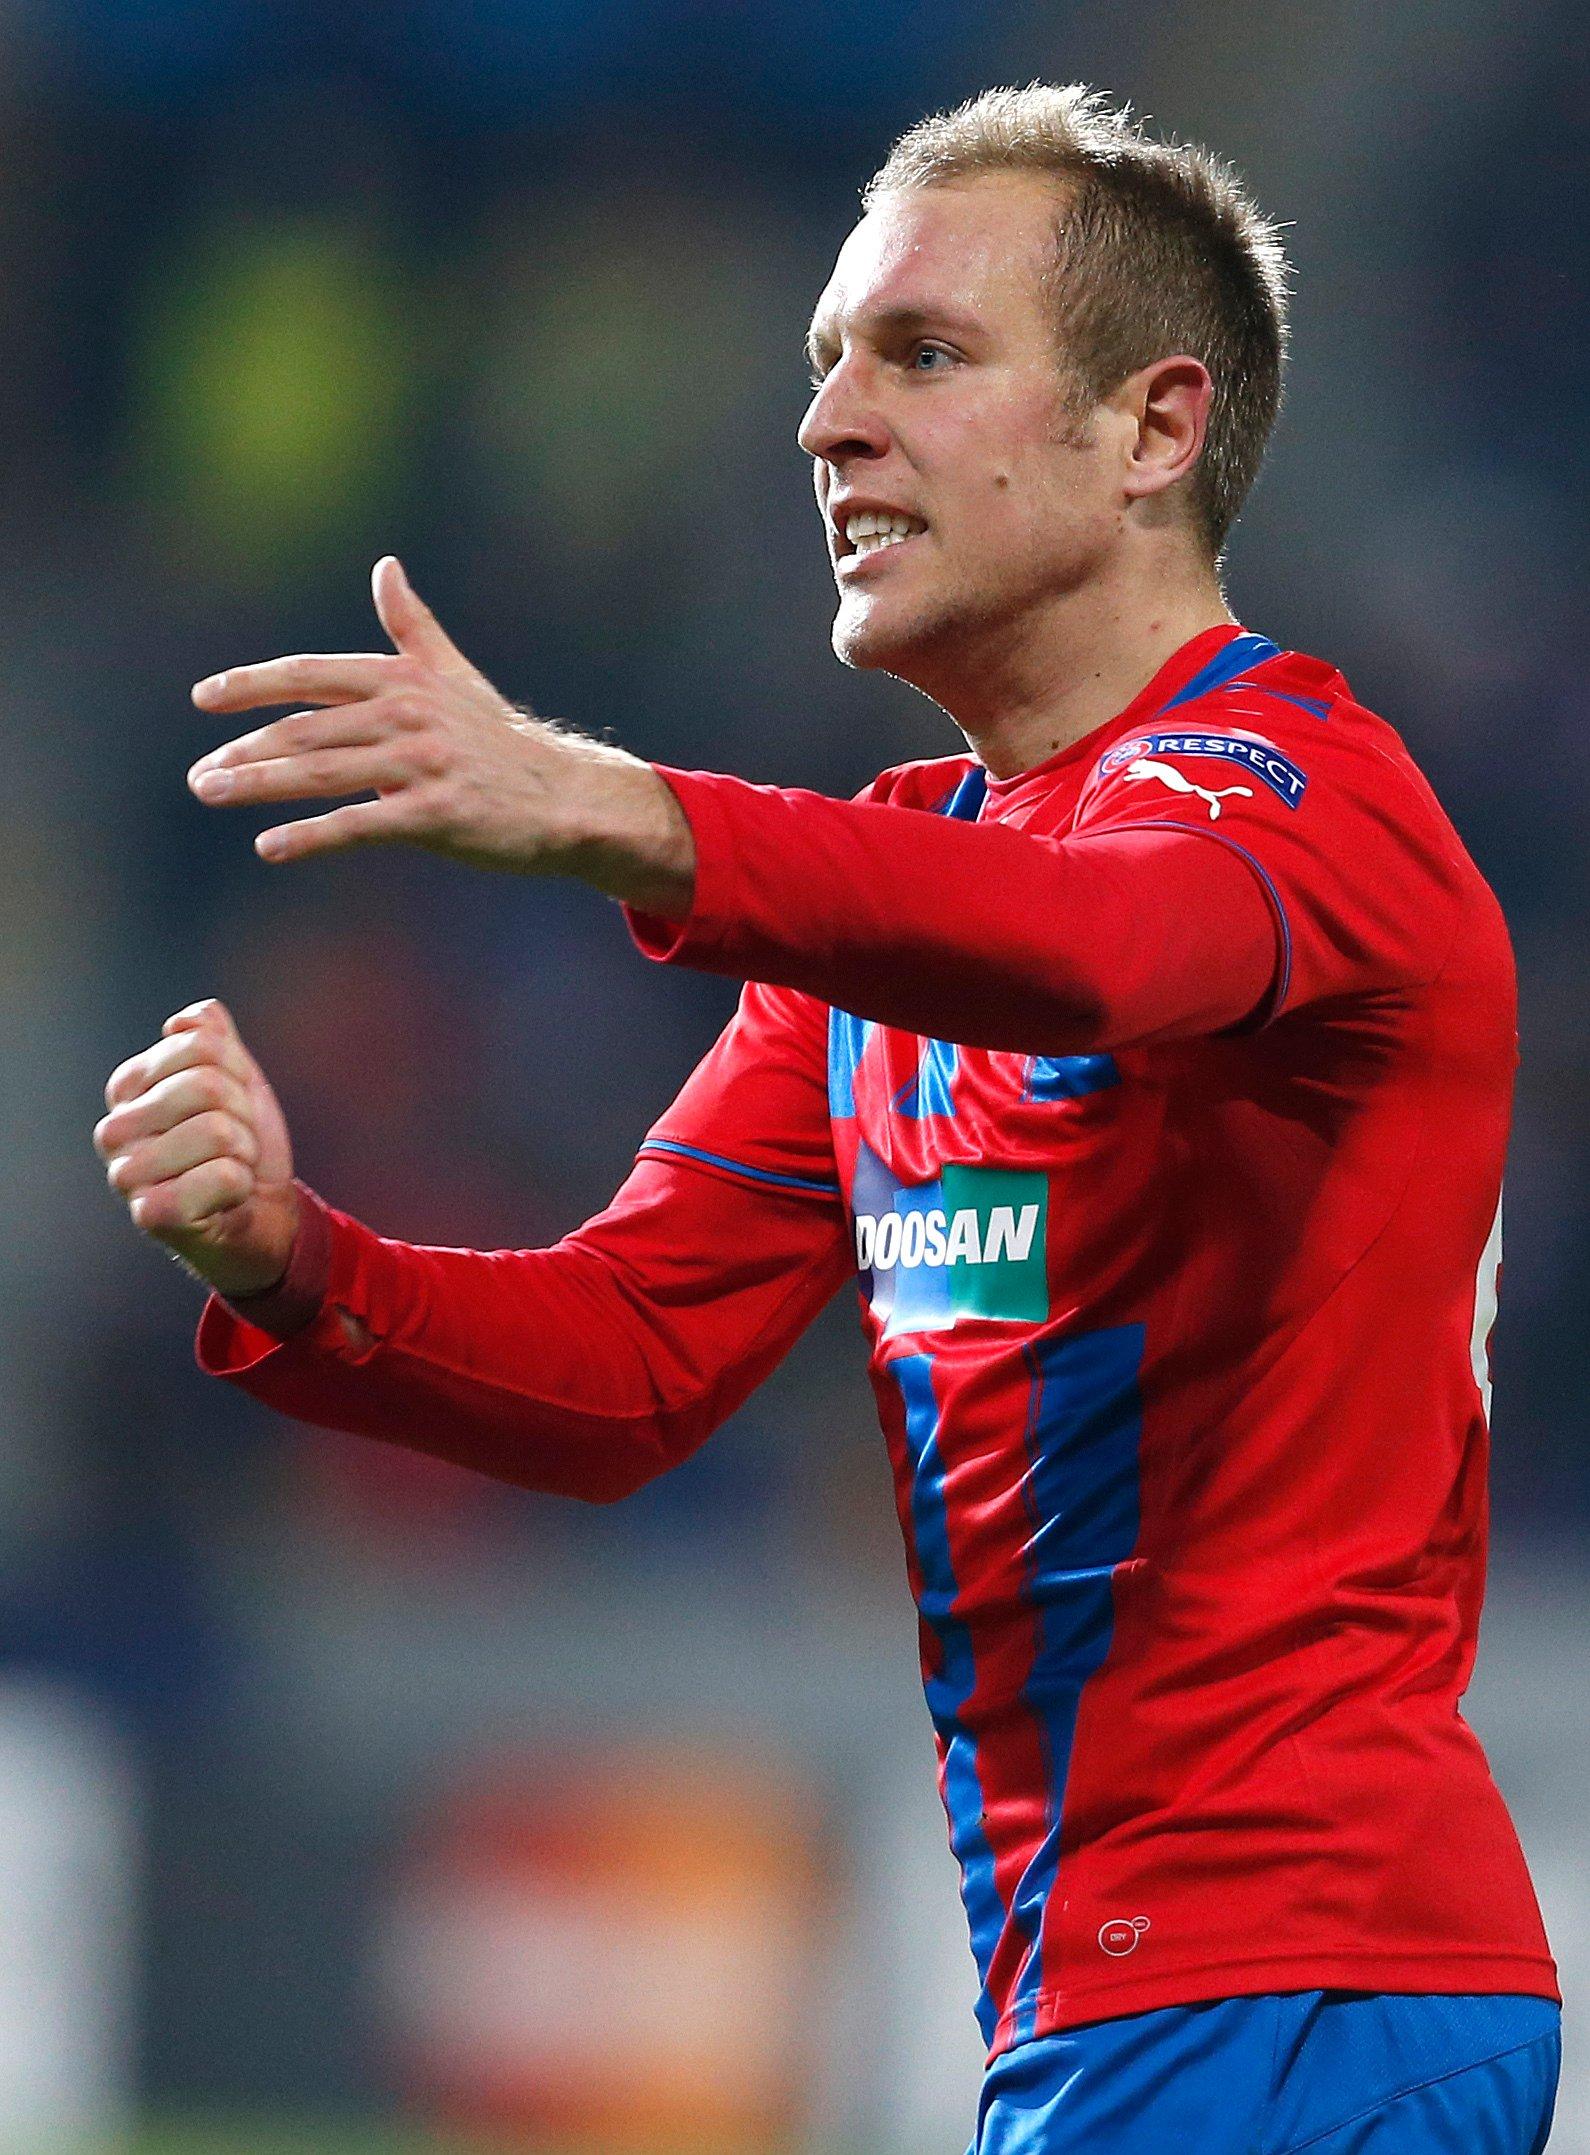 czech_republic_soccer_champions_league80_r7849.jpg